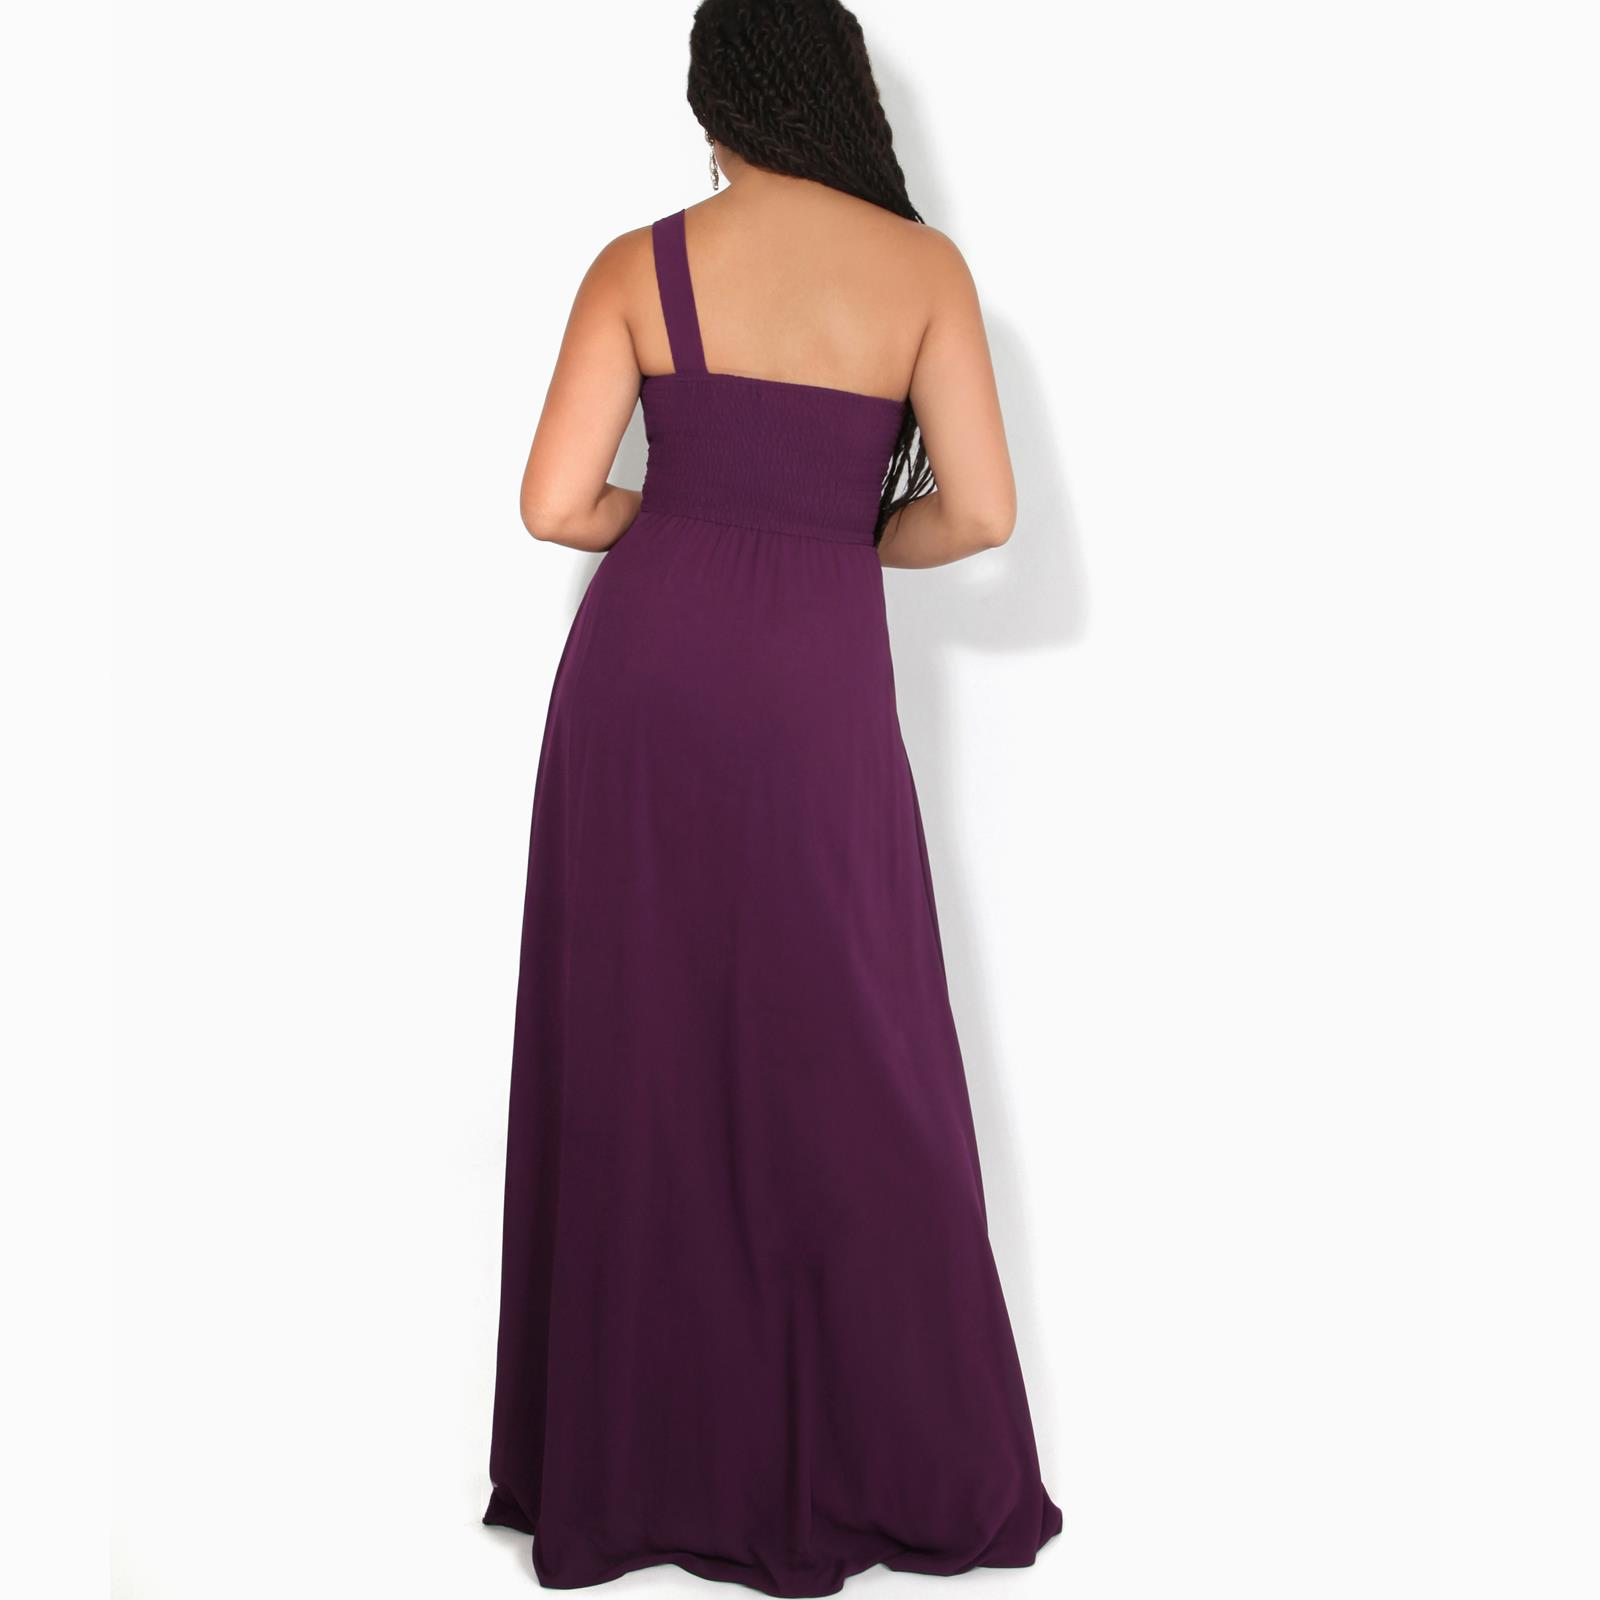 Womens-Wedding-Bridesmaid-Prom-Dress-Formal-One-Off-Shoulder-Long-Evening-8-18 thumbnail 8